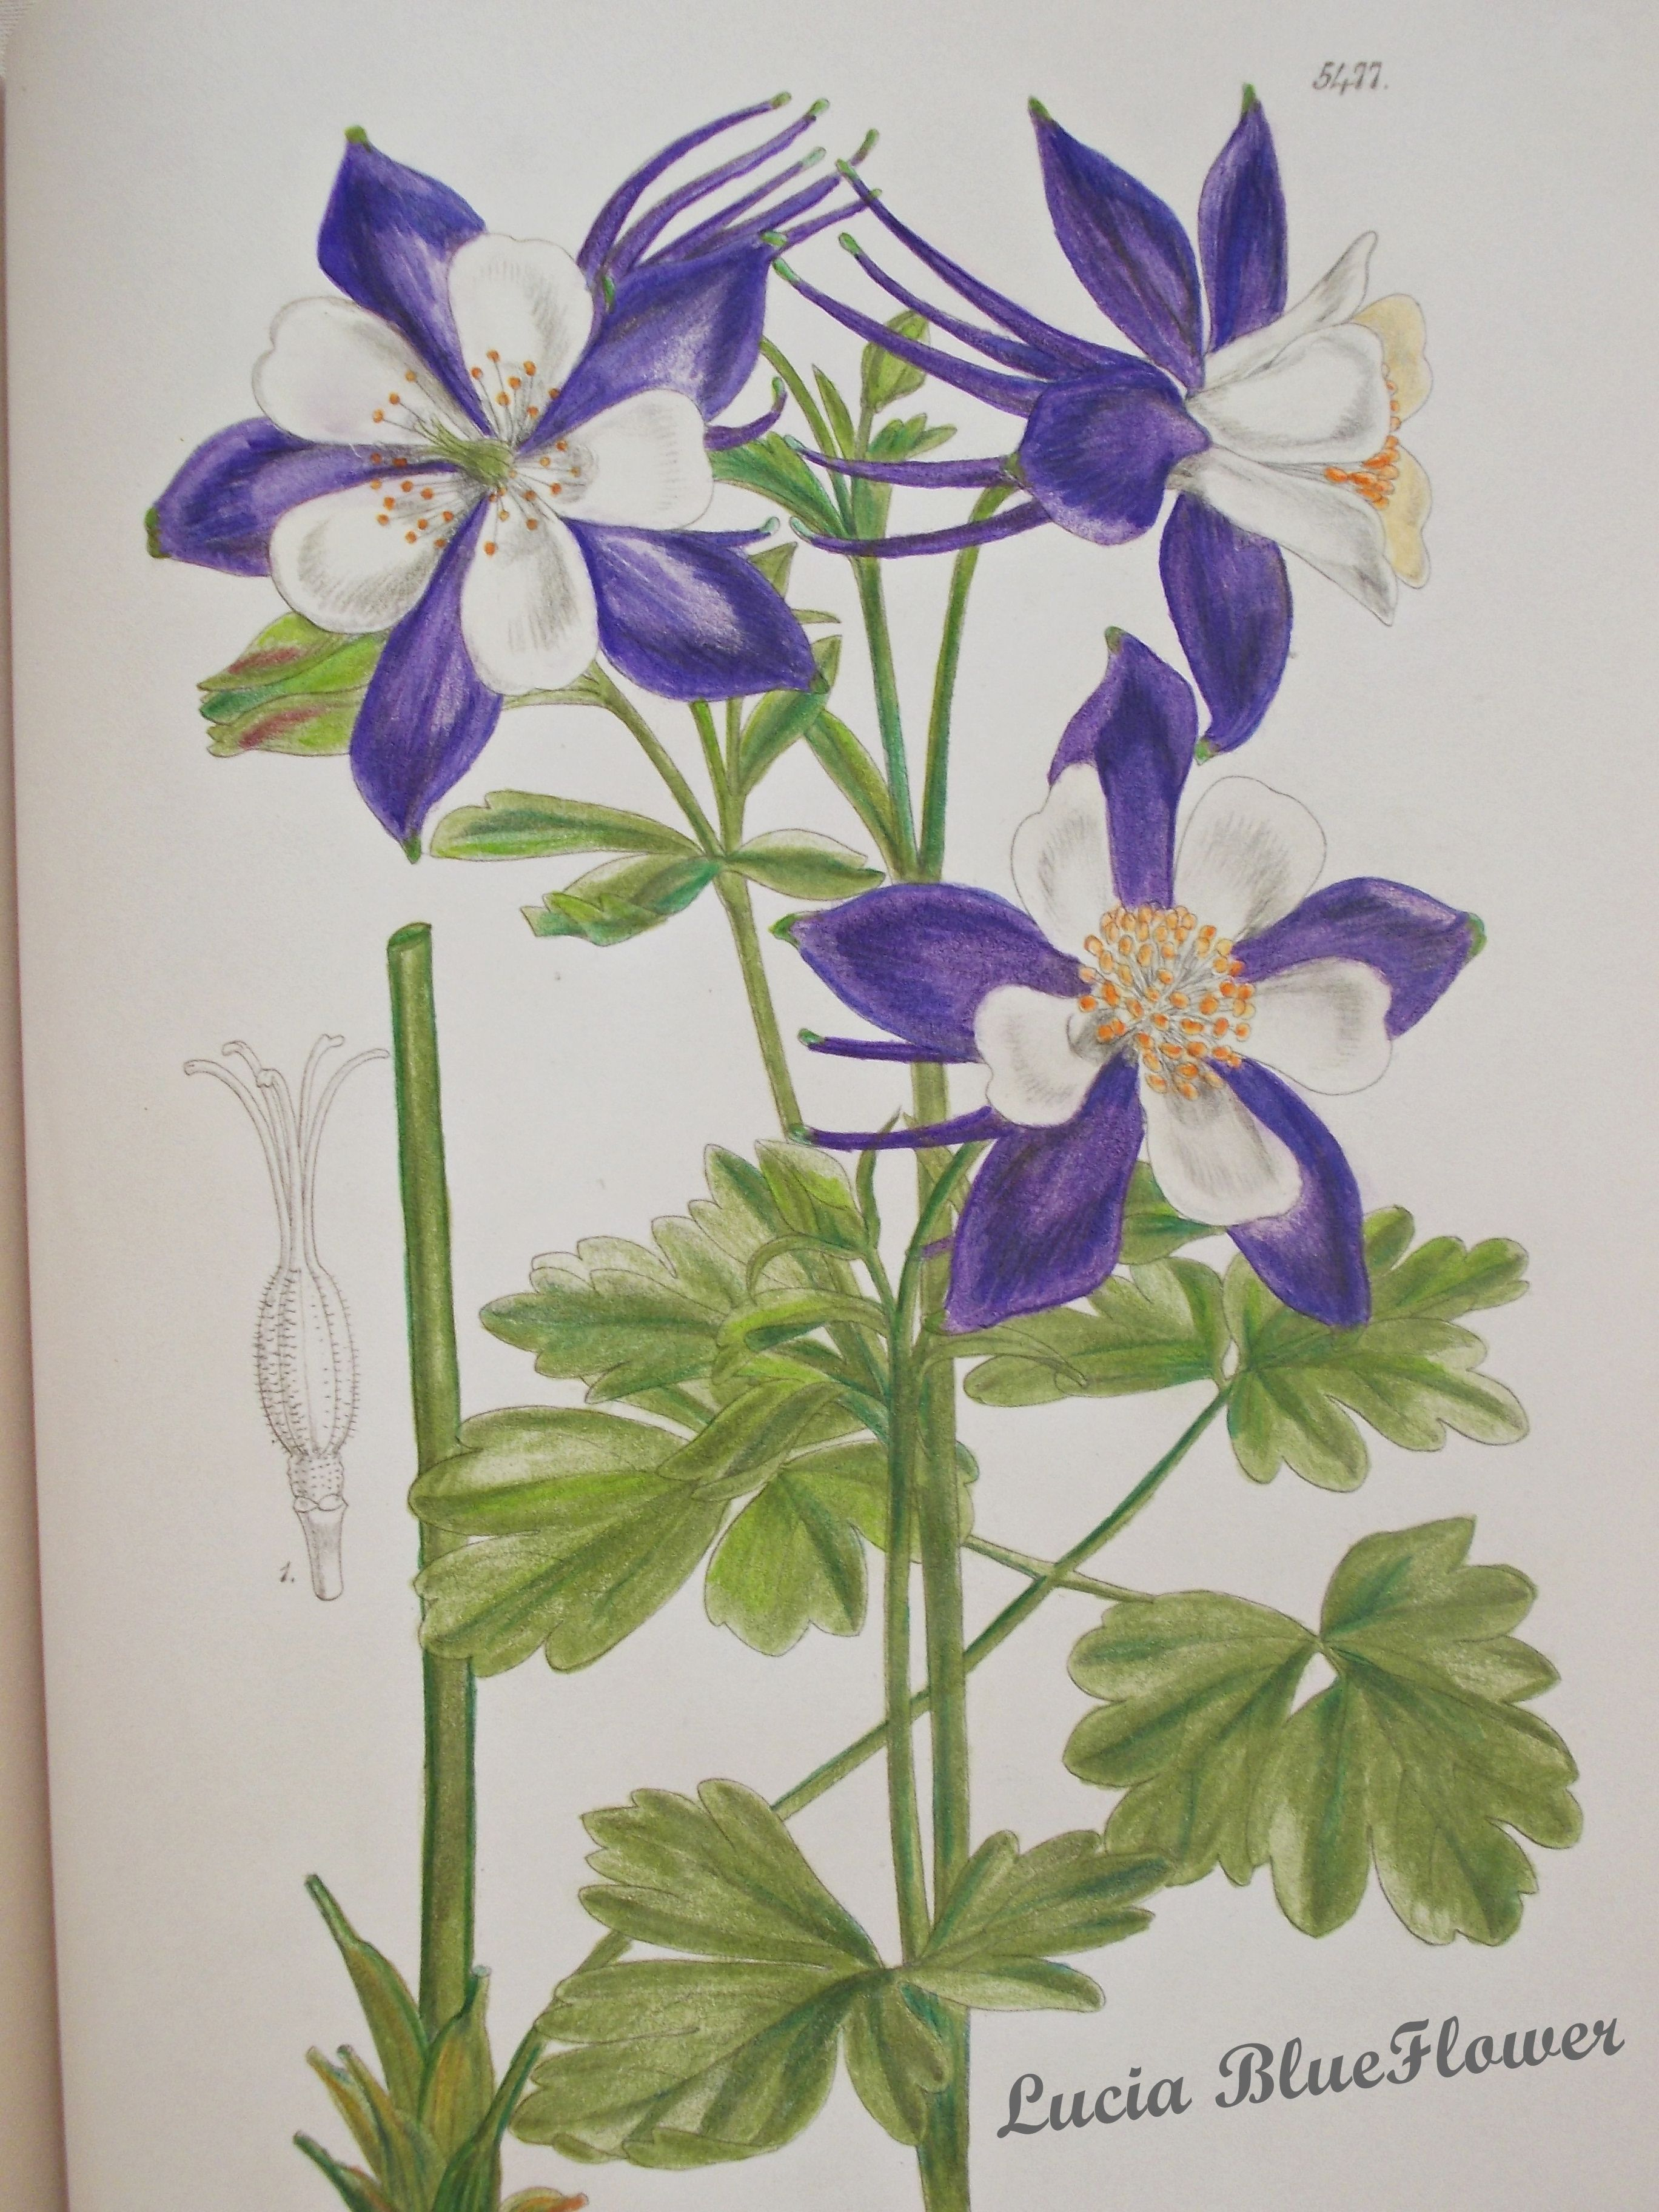 Coloring Books Aquilegia Caerulea Kew GardensFlowering